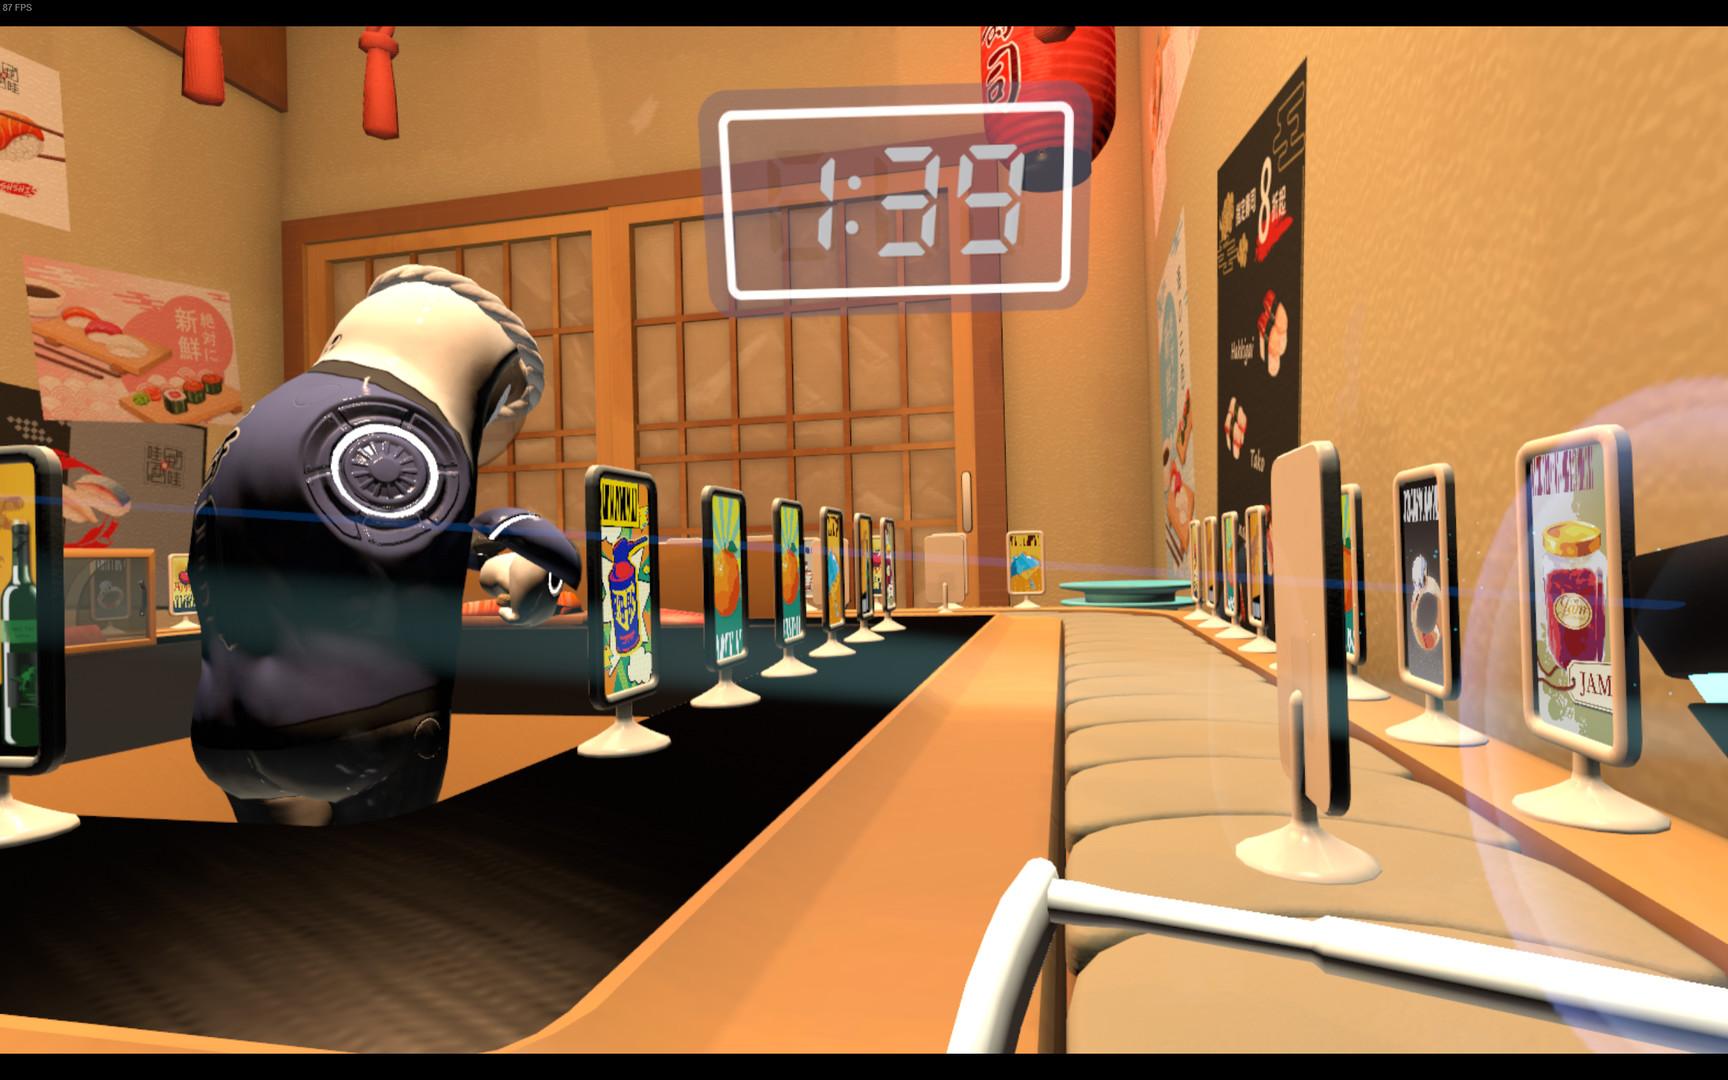 TAG WAR VR Free Download